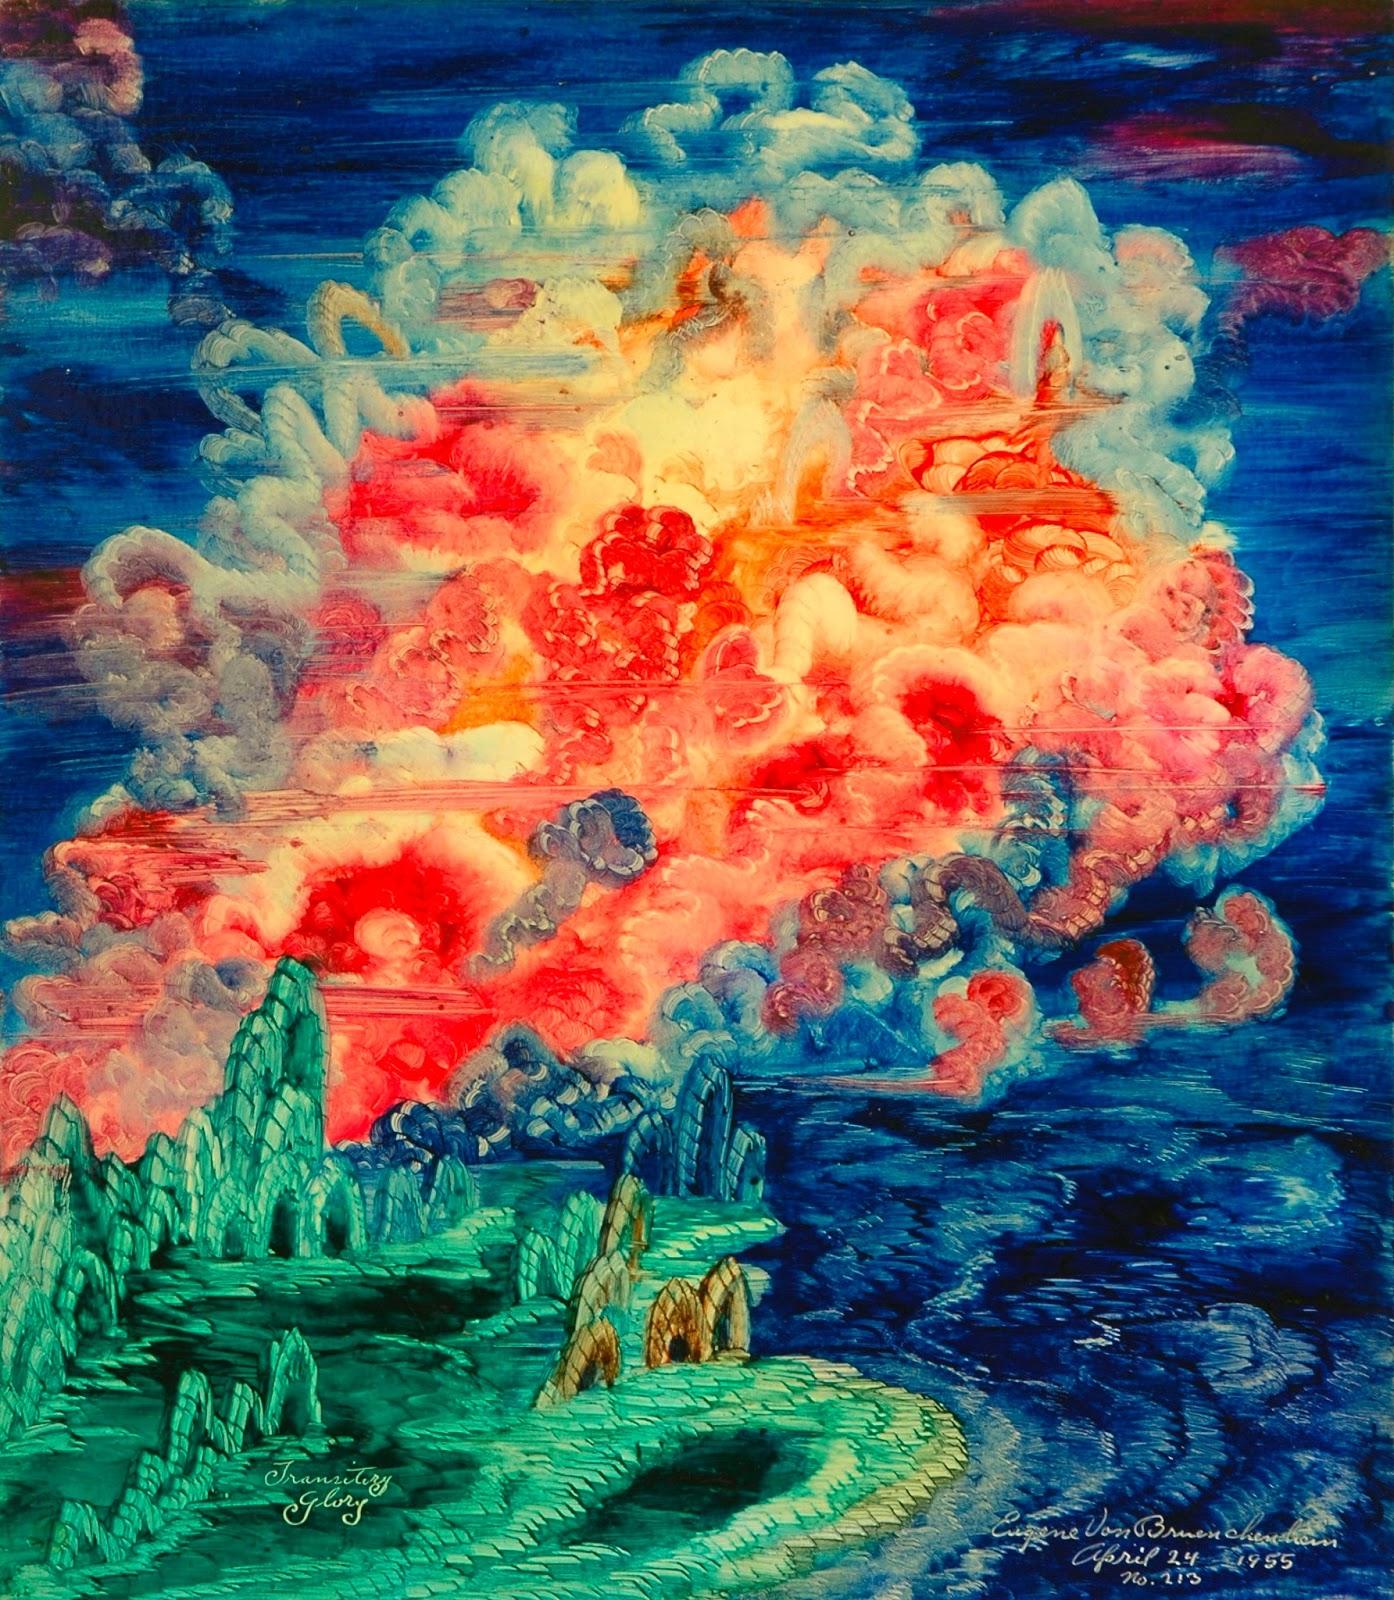 Appendage: Eugene Von Bruenchenhein - Paintings